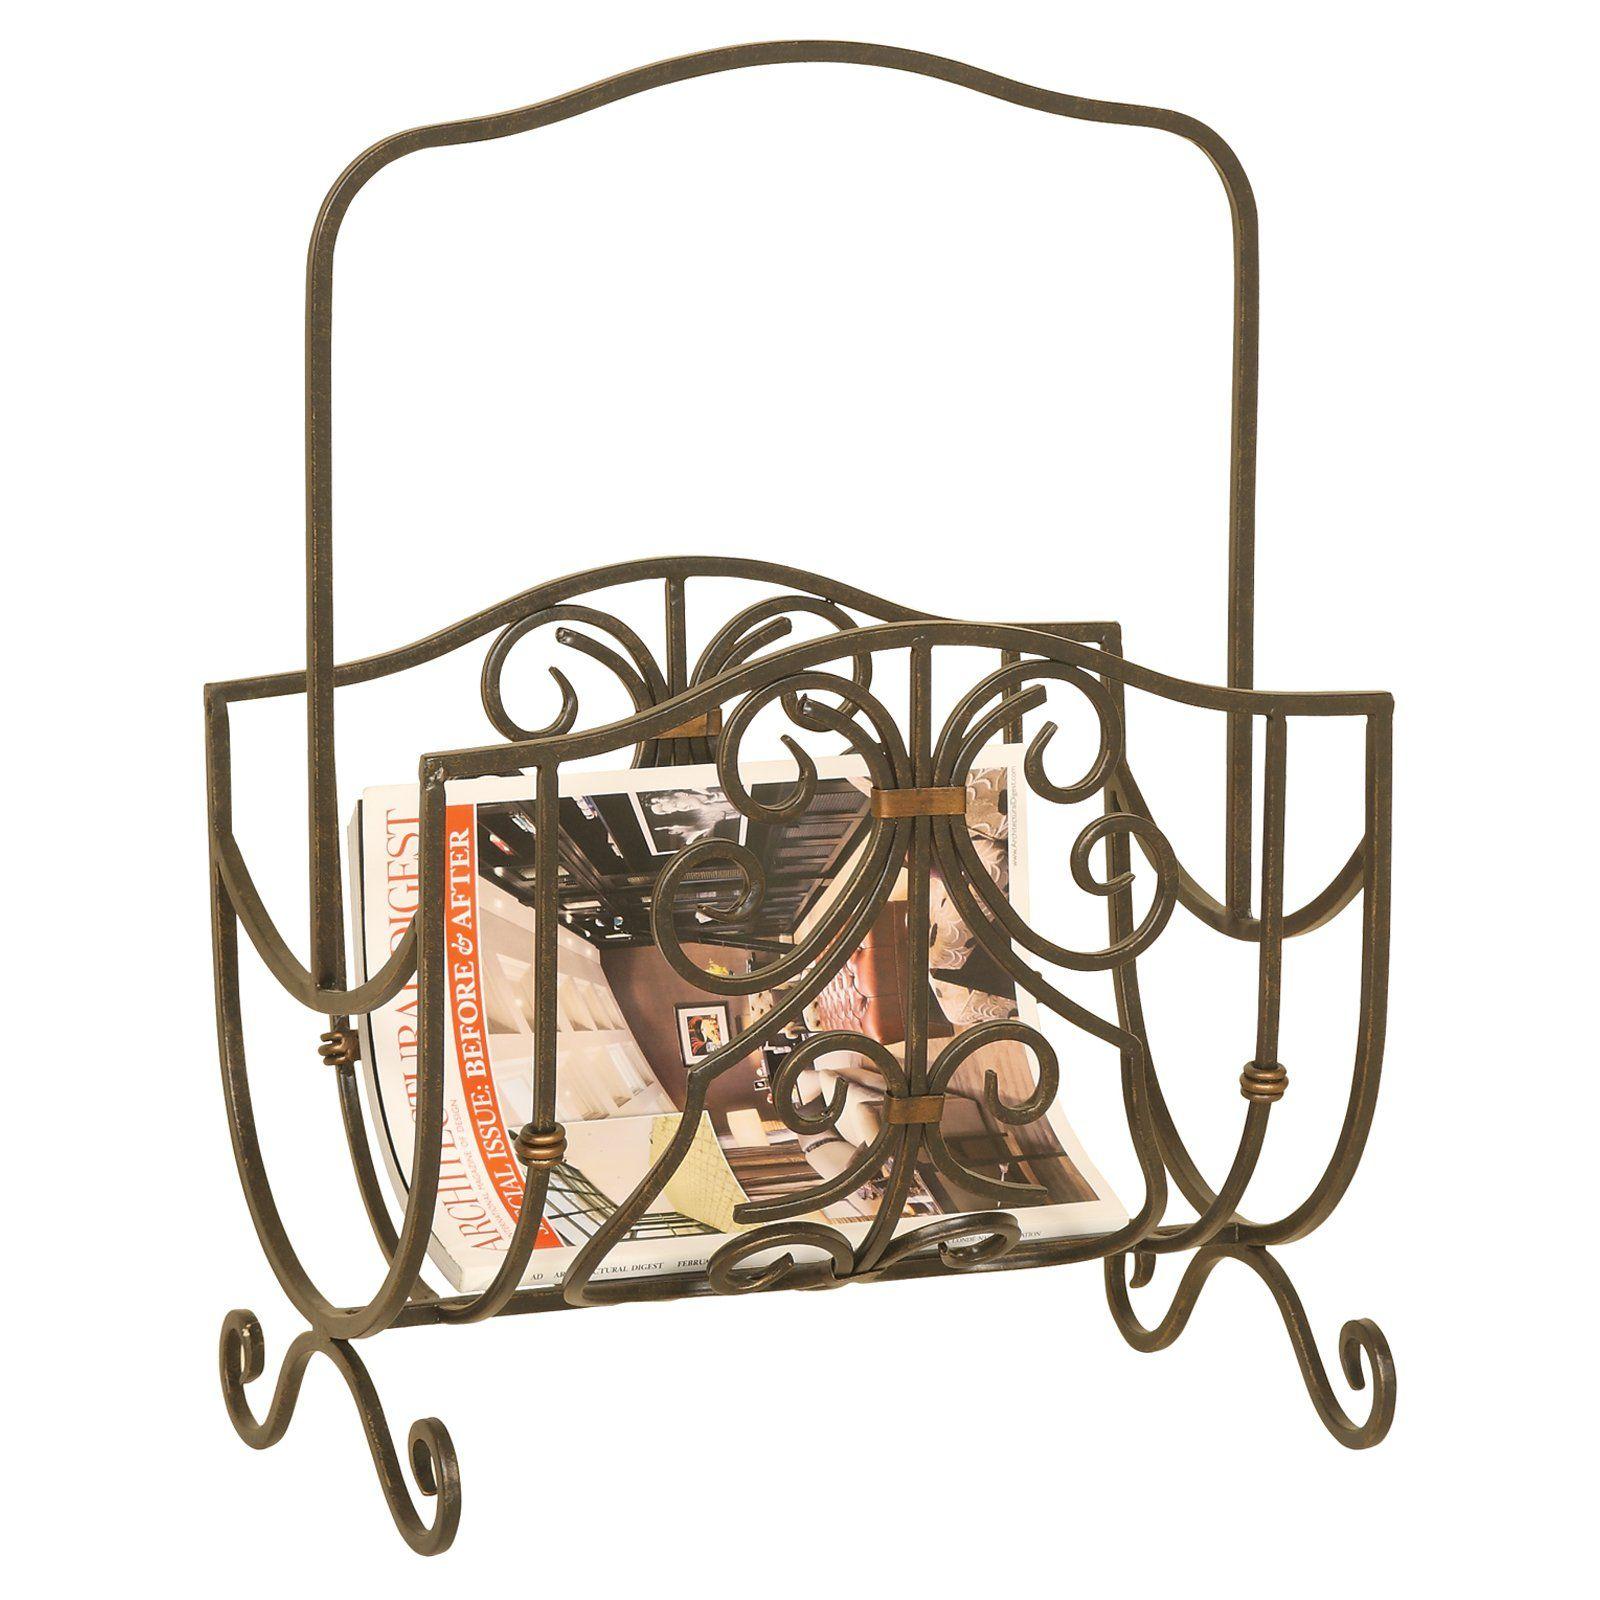 Bathroom magazine rack wall mount oil rubbed bronze